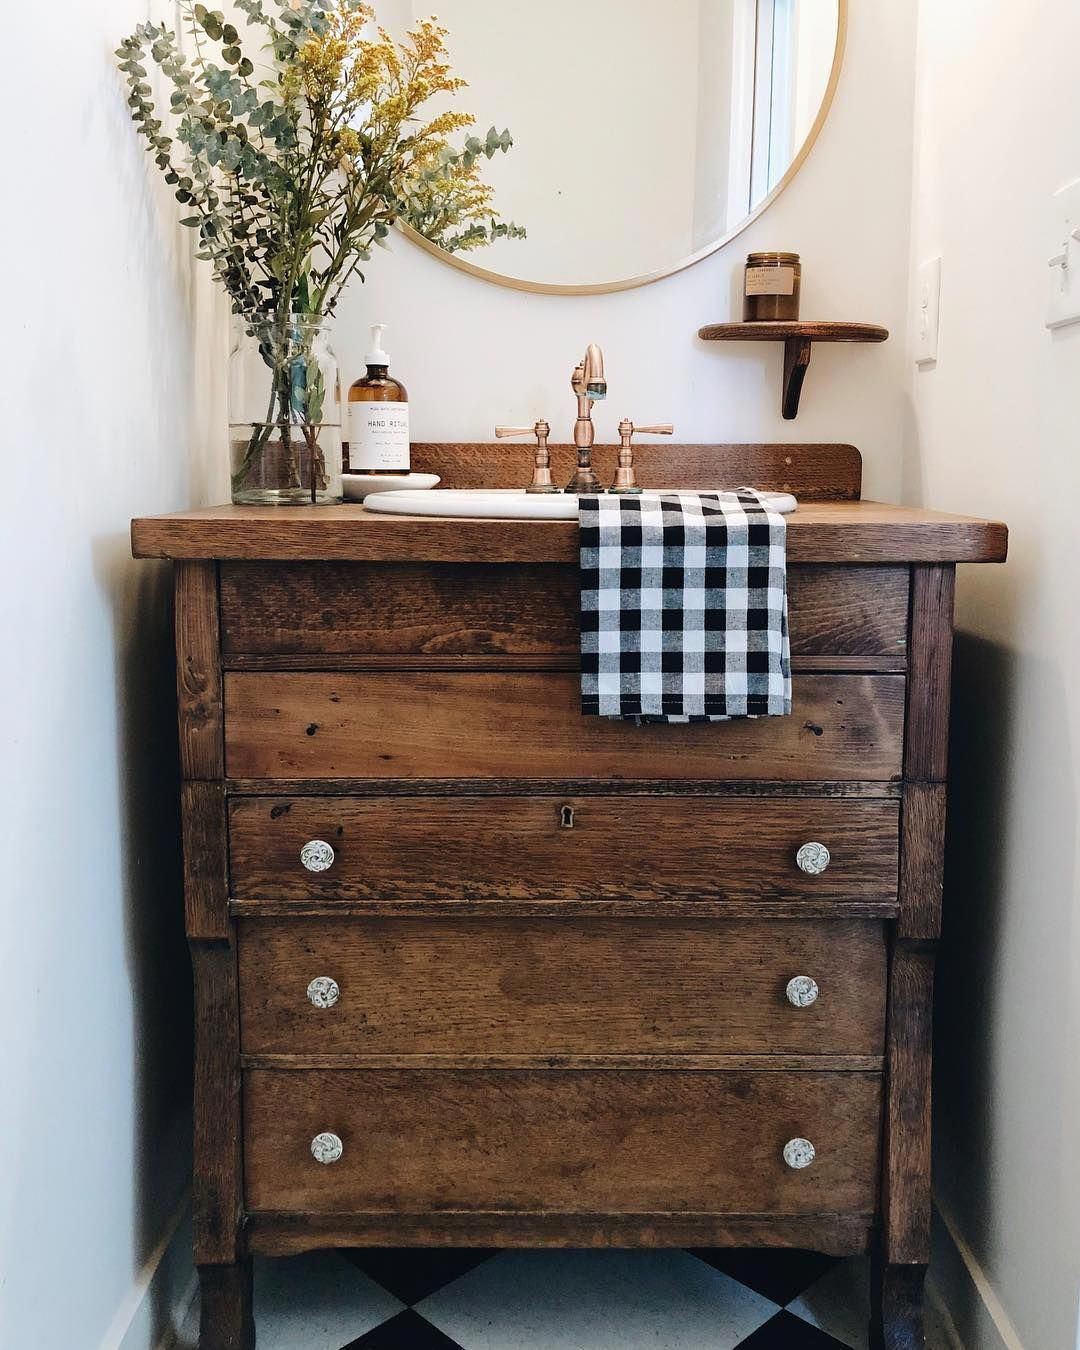 50 Modern Apartment Bathroom Pictures Bathroom Decor Bathrooms Remodel Amazing Bathrooms